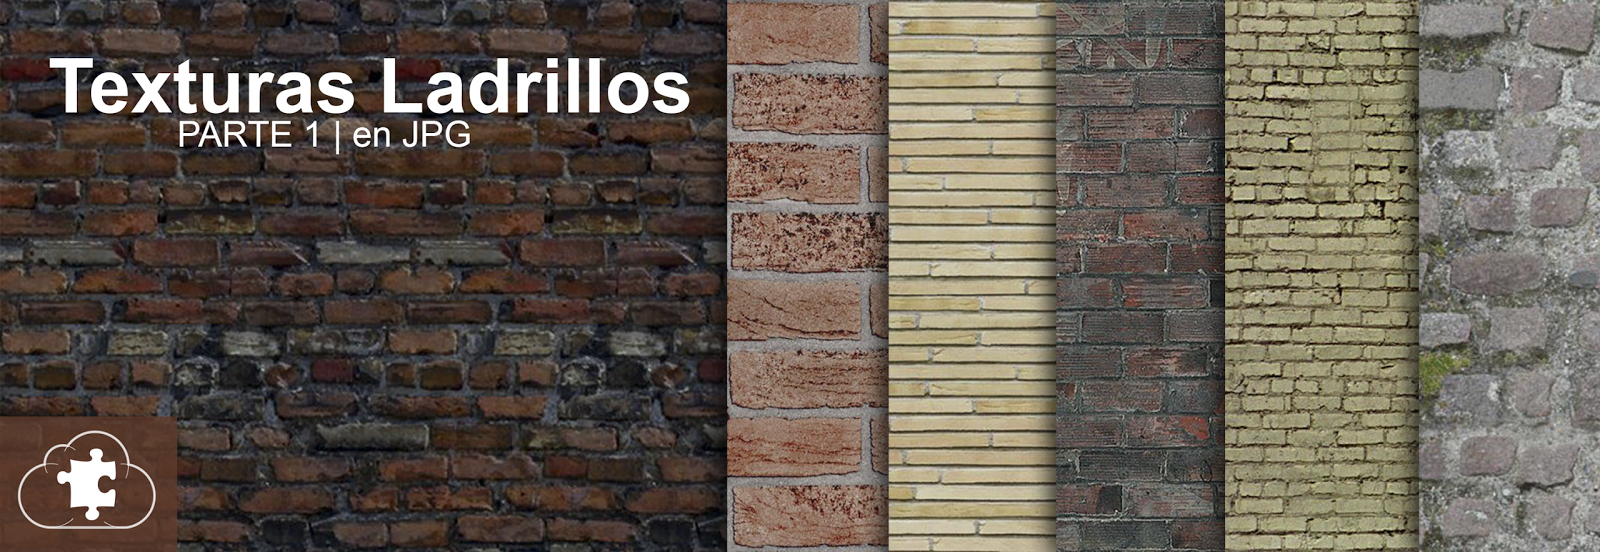 Texturas Ladrillos (jpg) | parte1 |